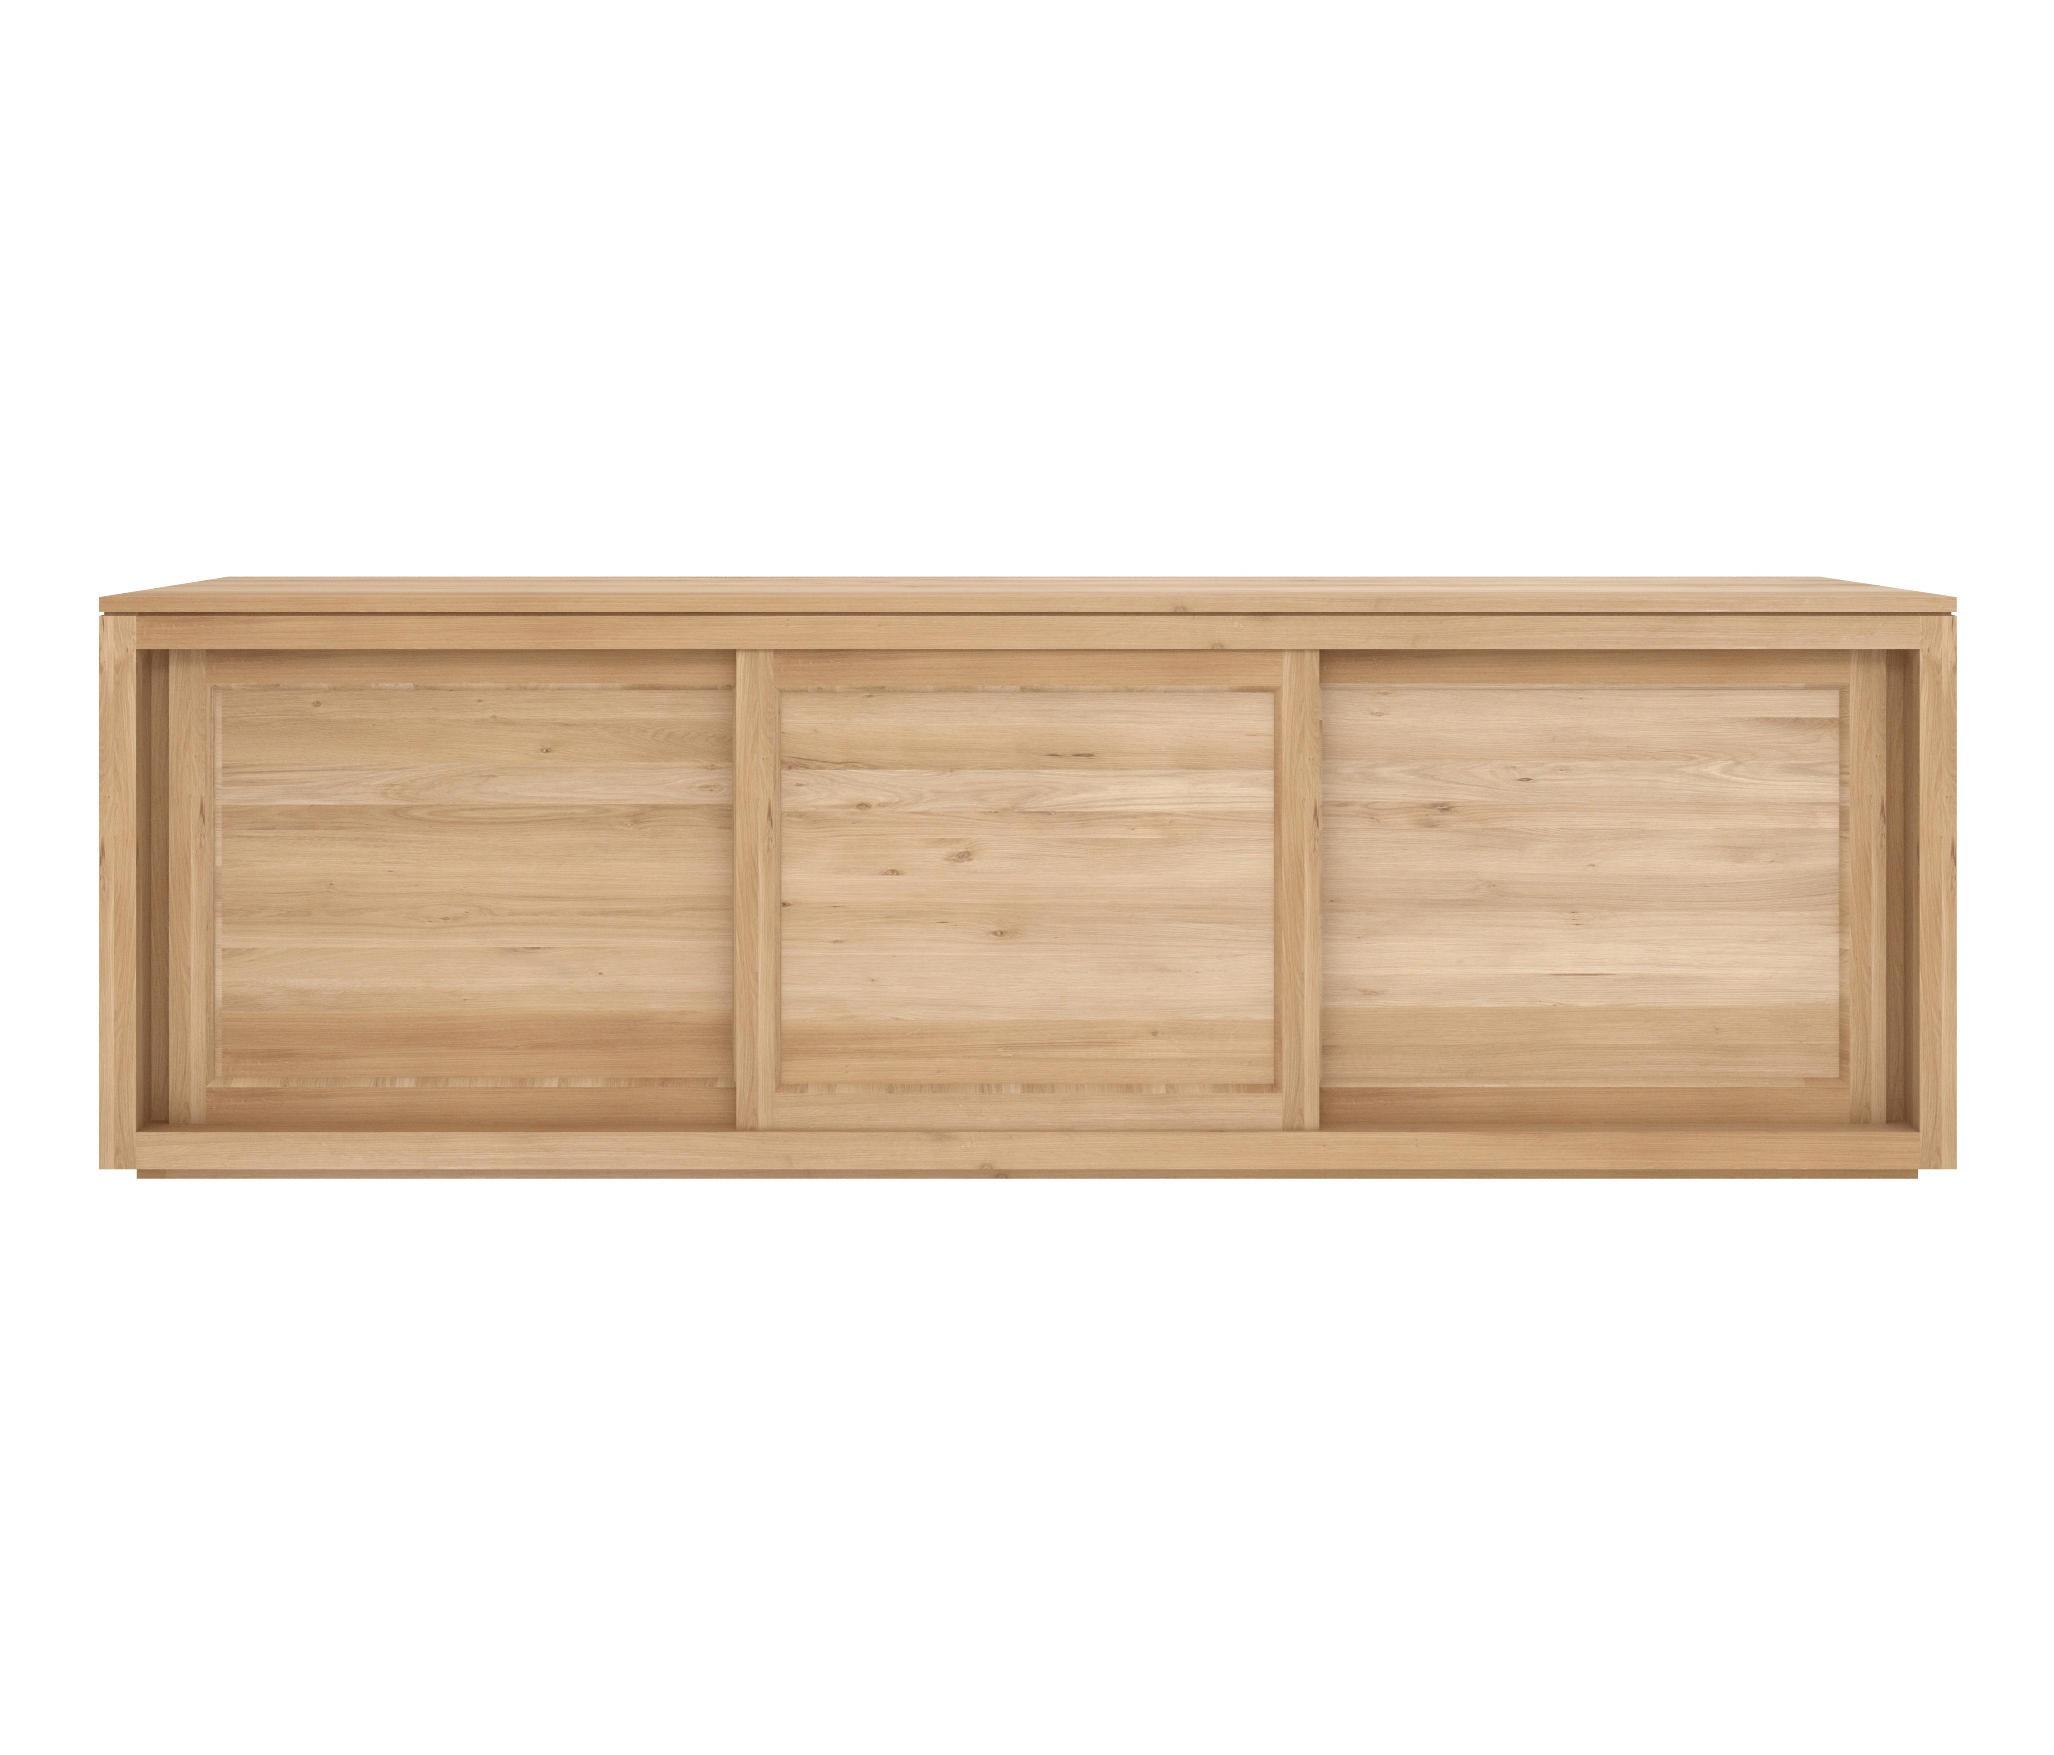 Ethnicraft oak pure sideboard 200 cm 3 sliding doors vtopaller Gallery